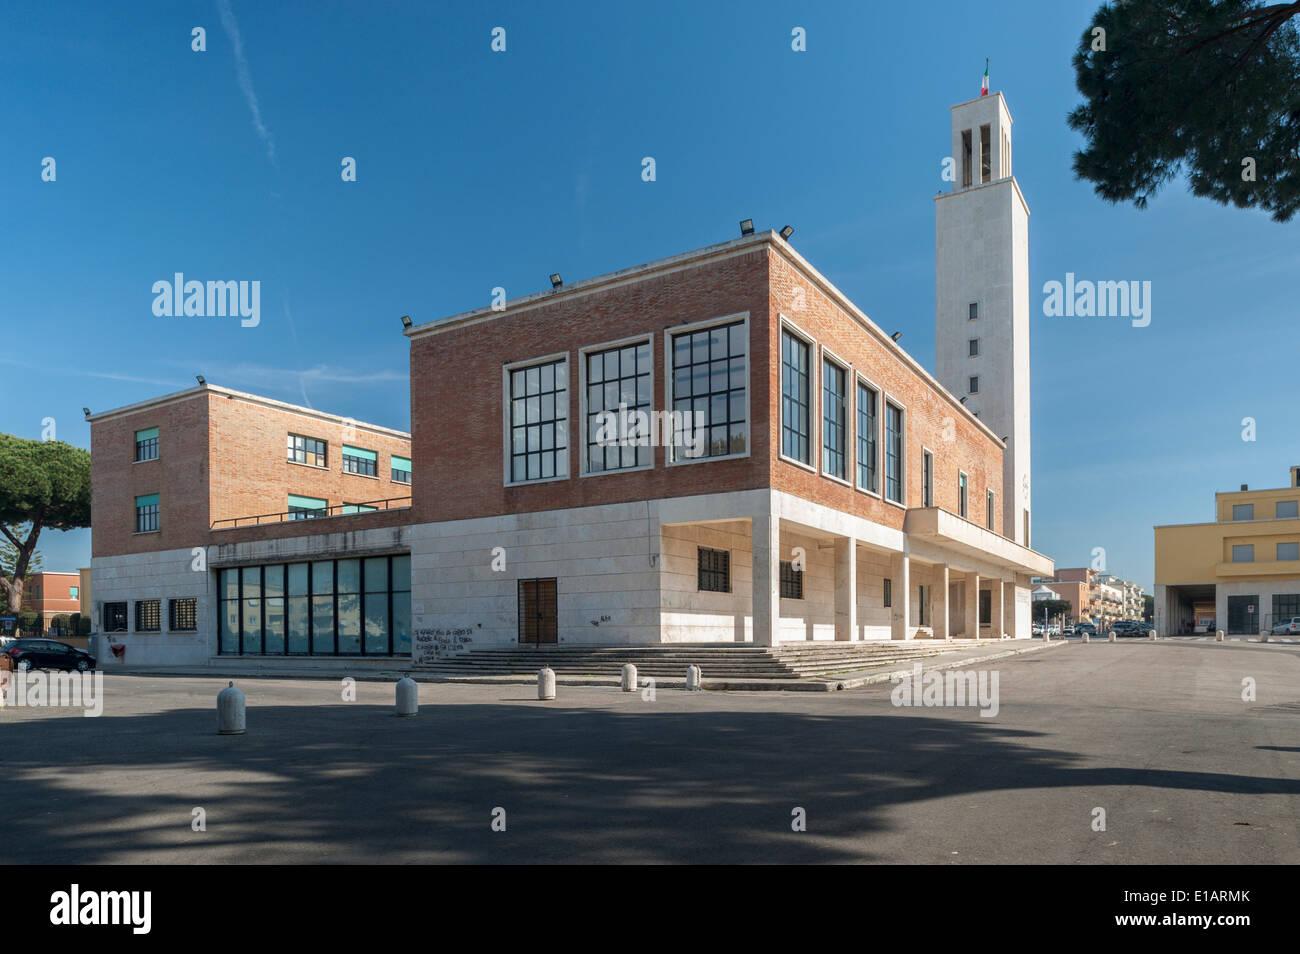 Rathaus mit seinem Turm Monumentalarchitektur, italienischen Rationalismus, Sabaudia, Lazio, Italien Stockbild